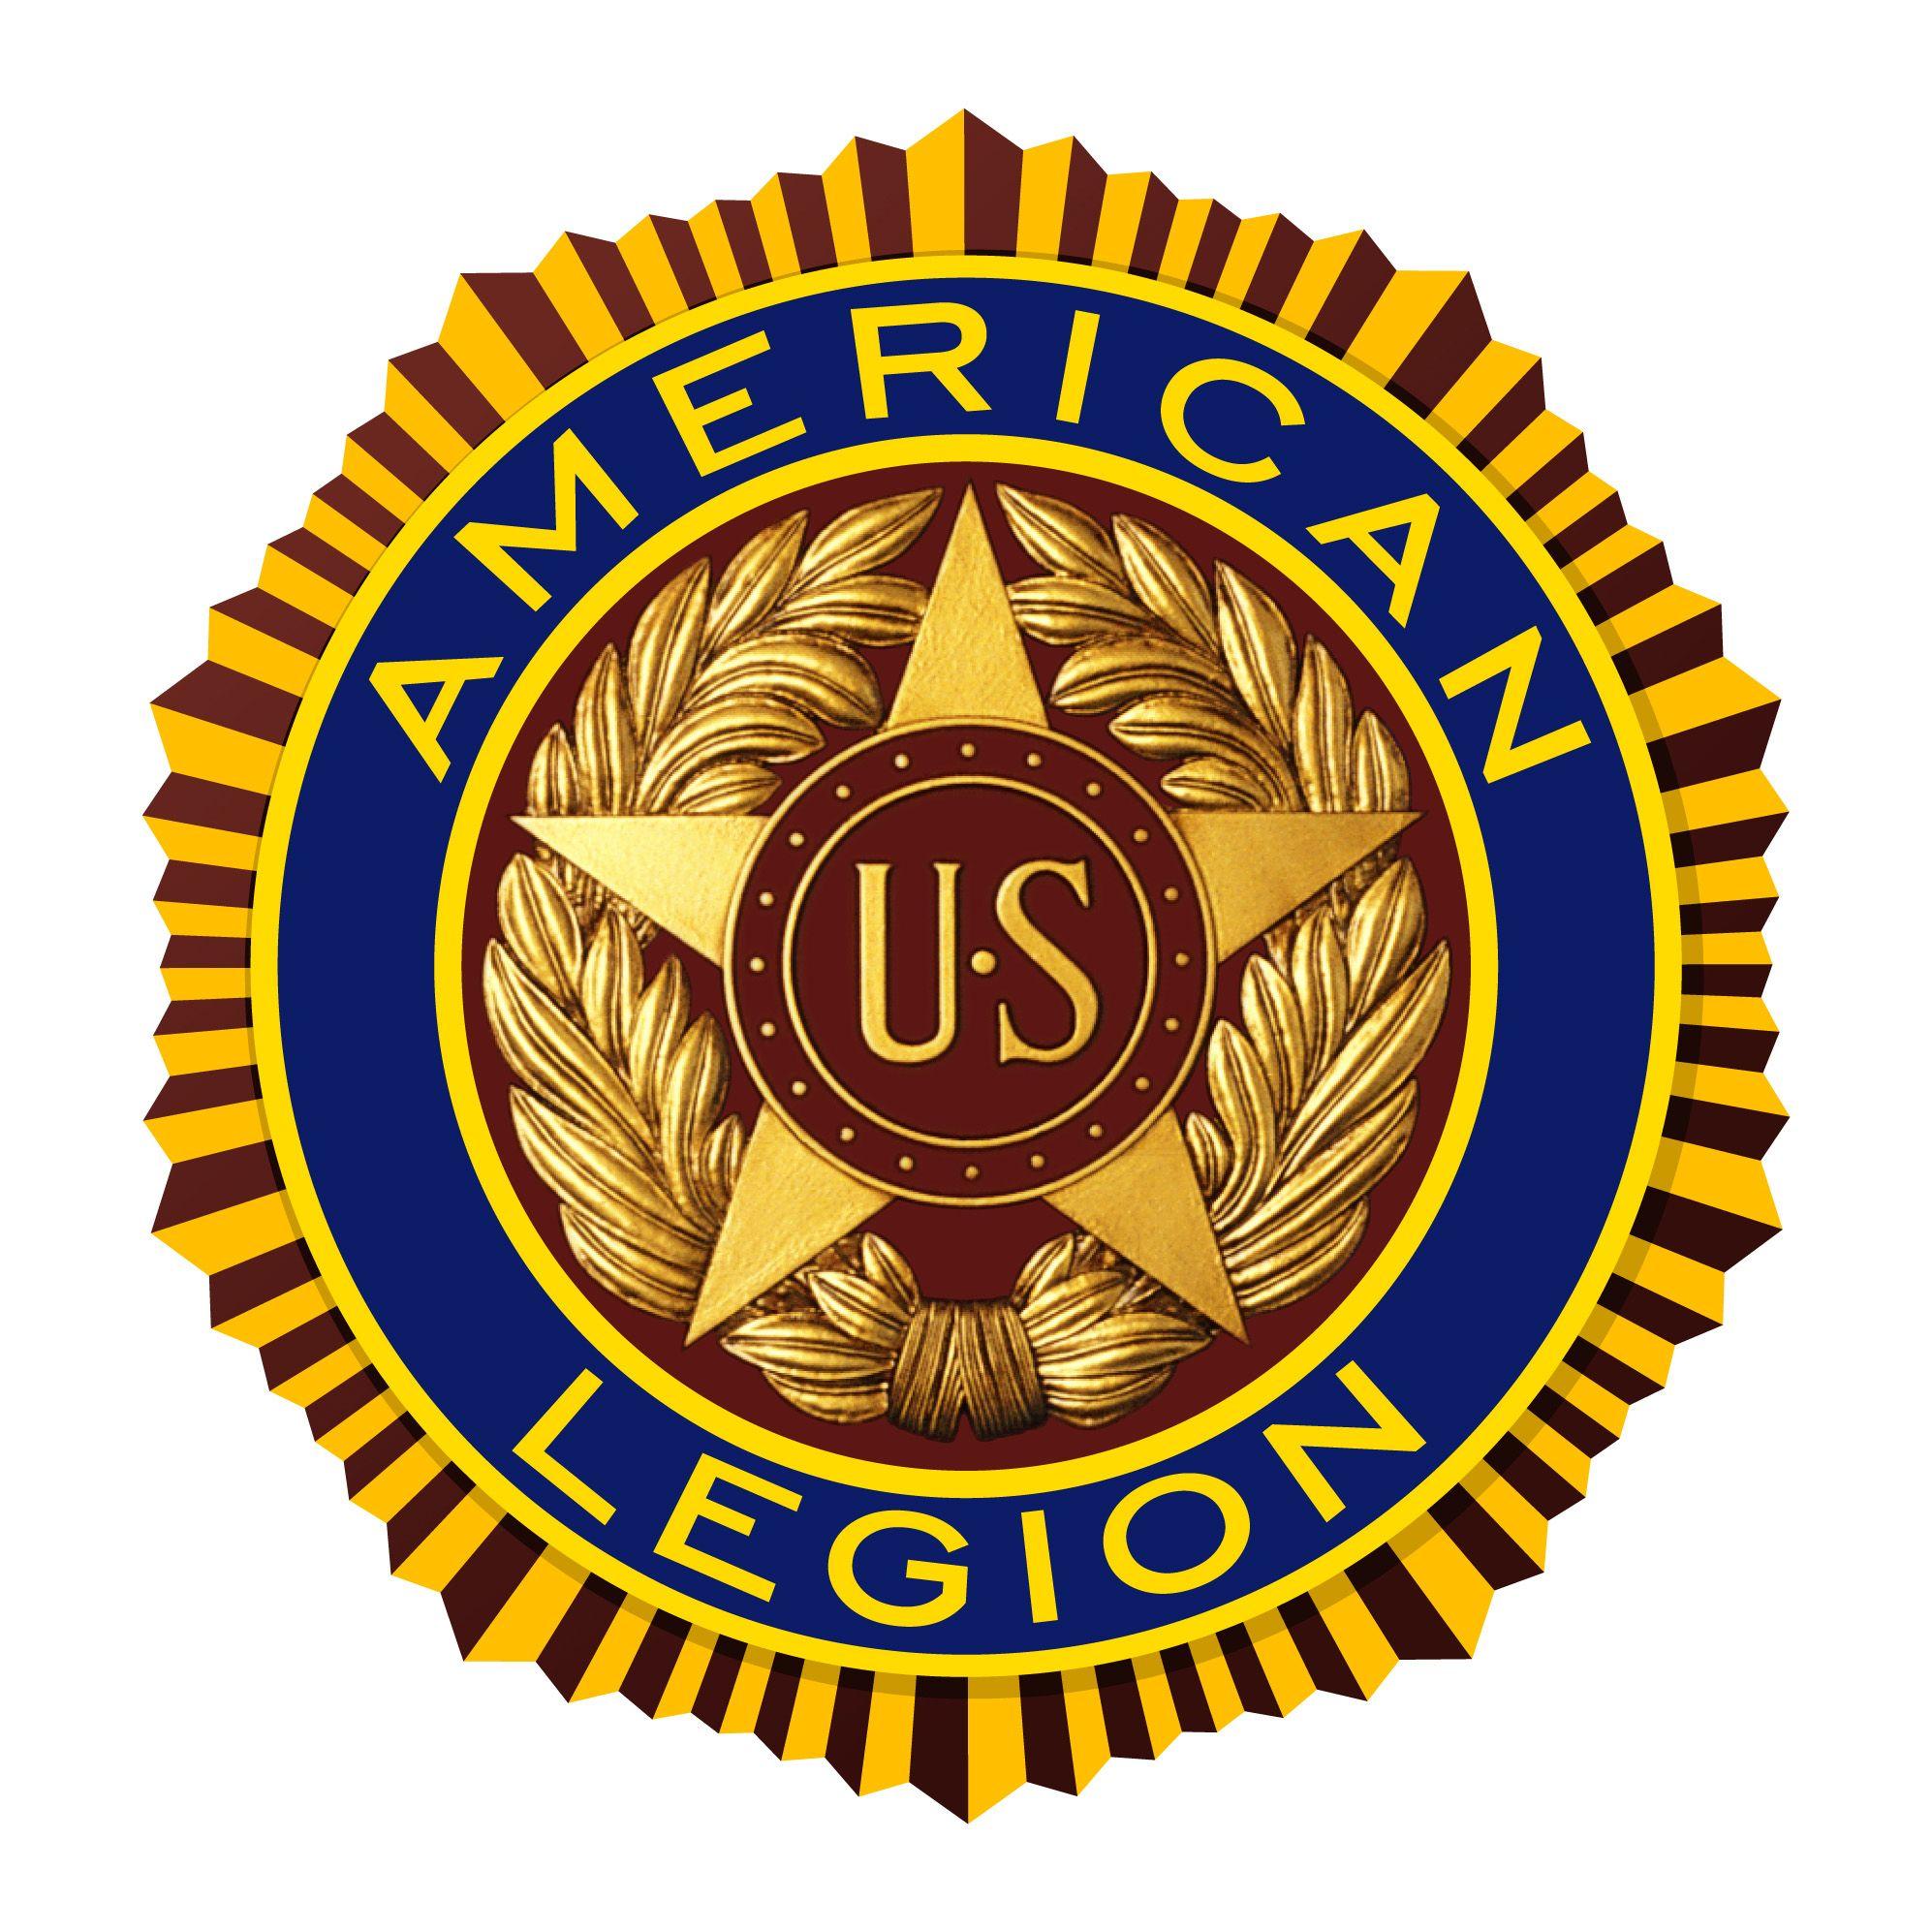 American Legion Life Member Post 539 New Bern NC Likes